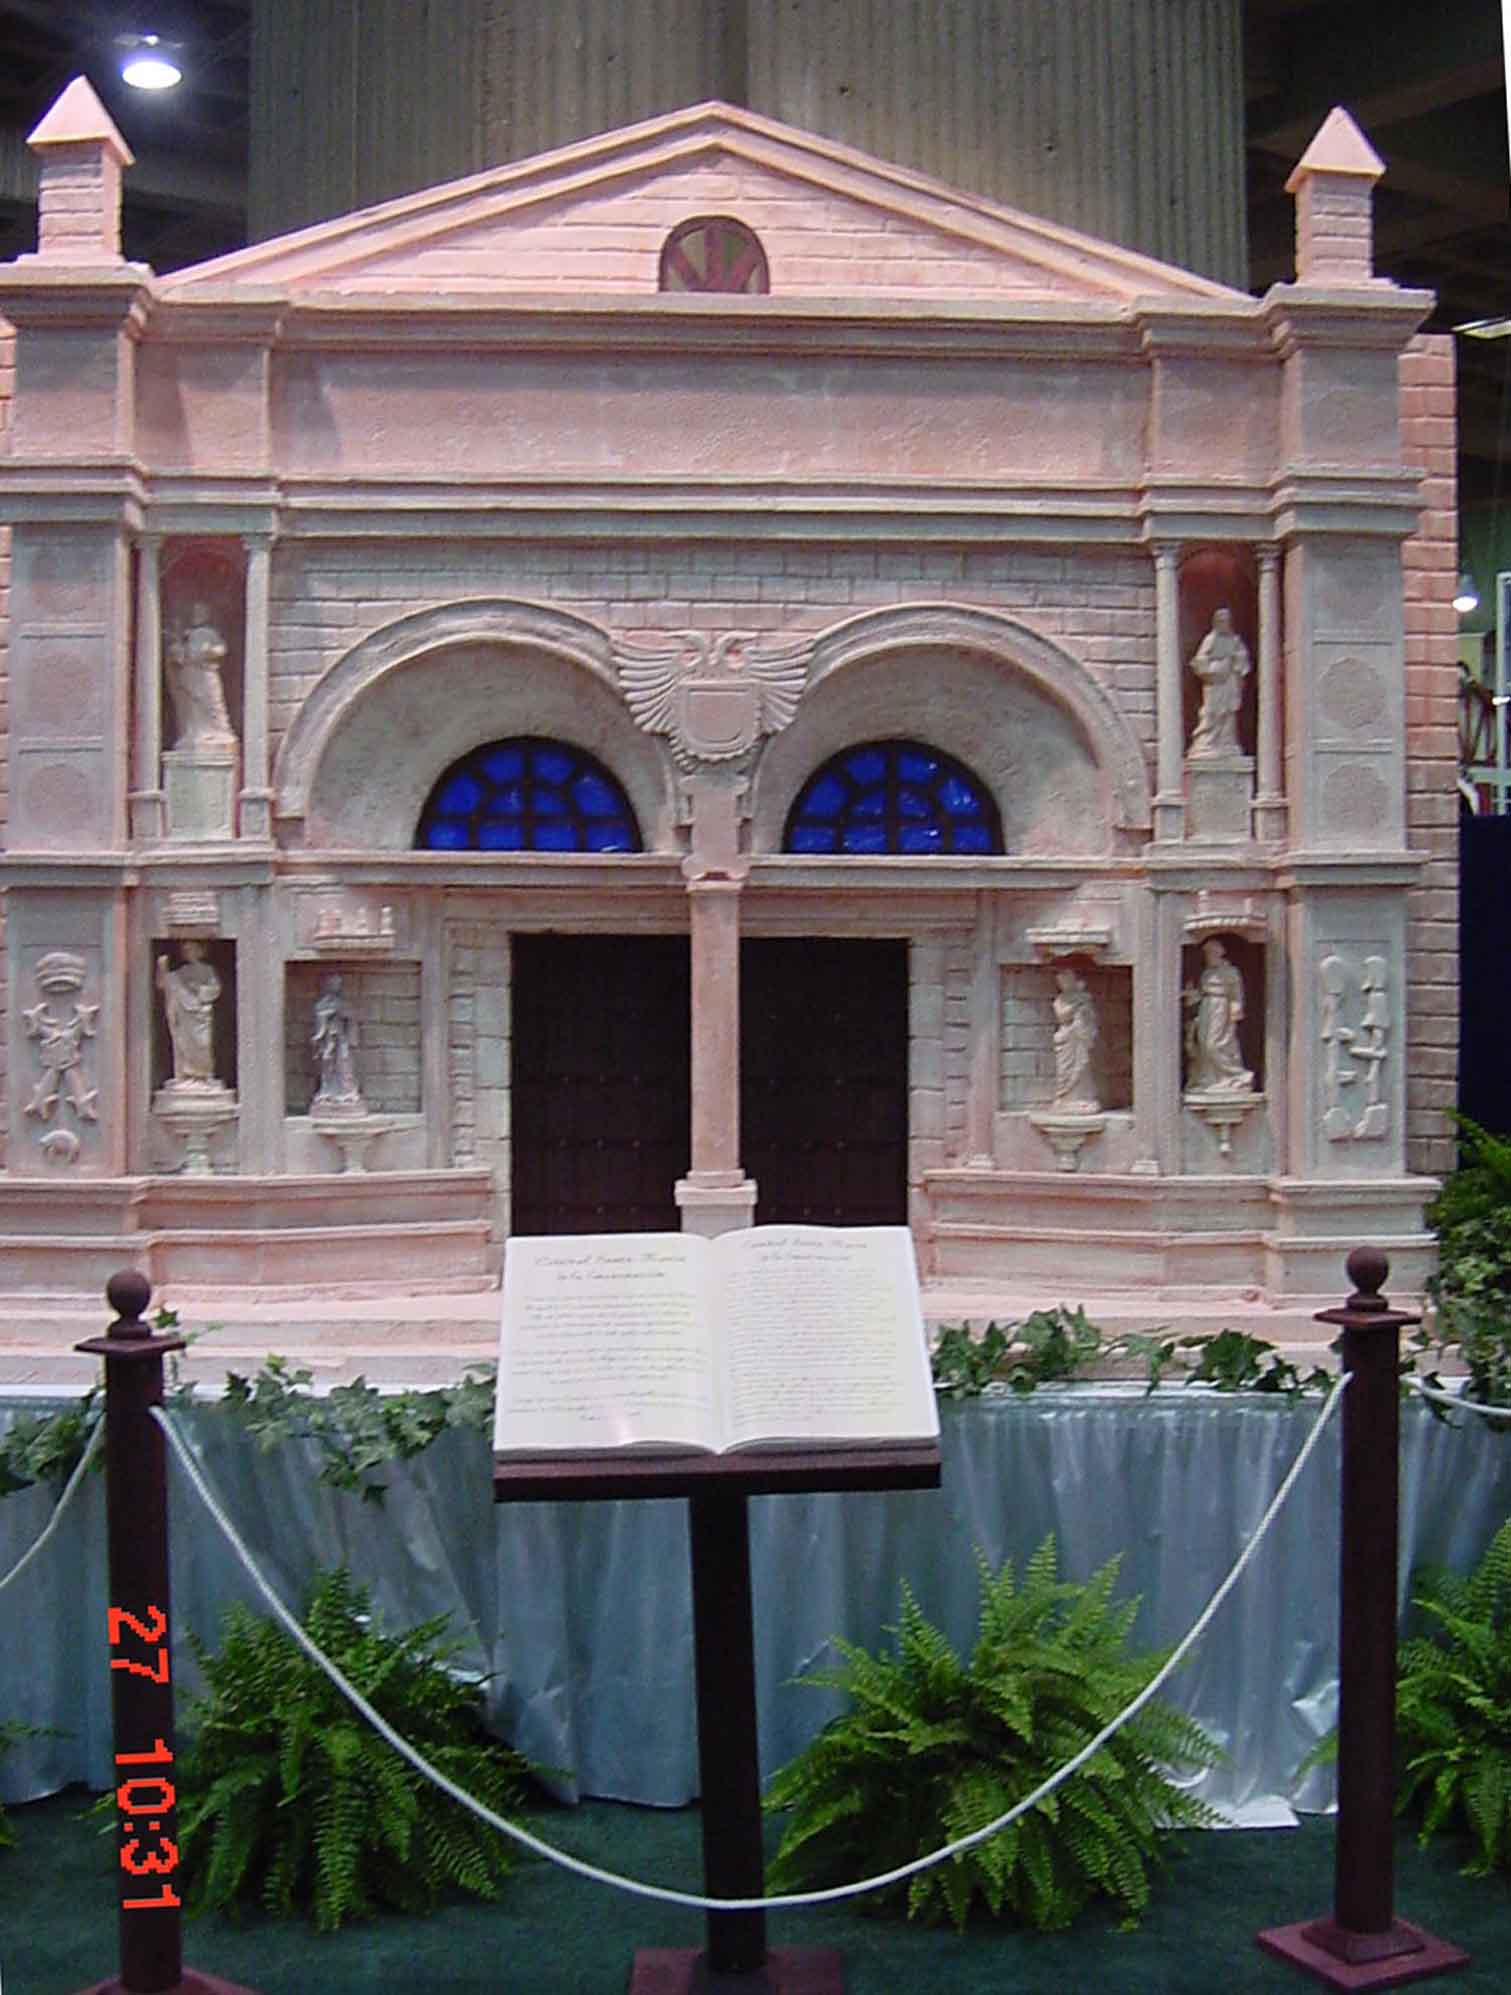 Catedral y libro pavellon.jpg